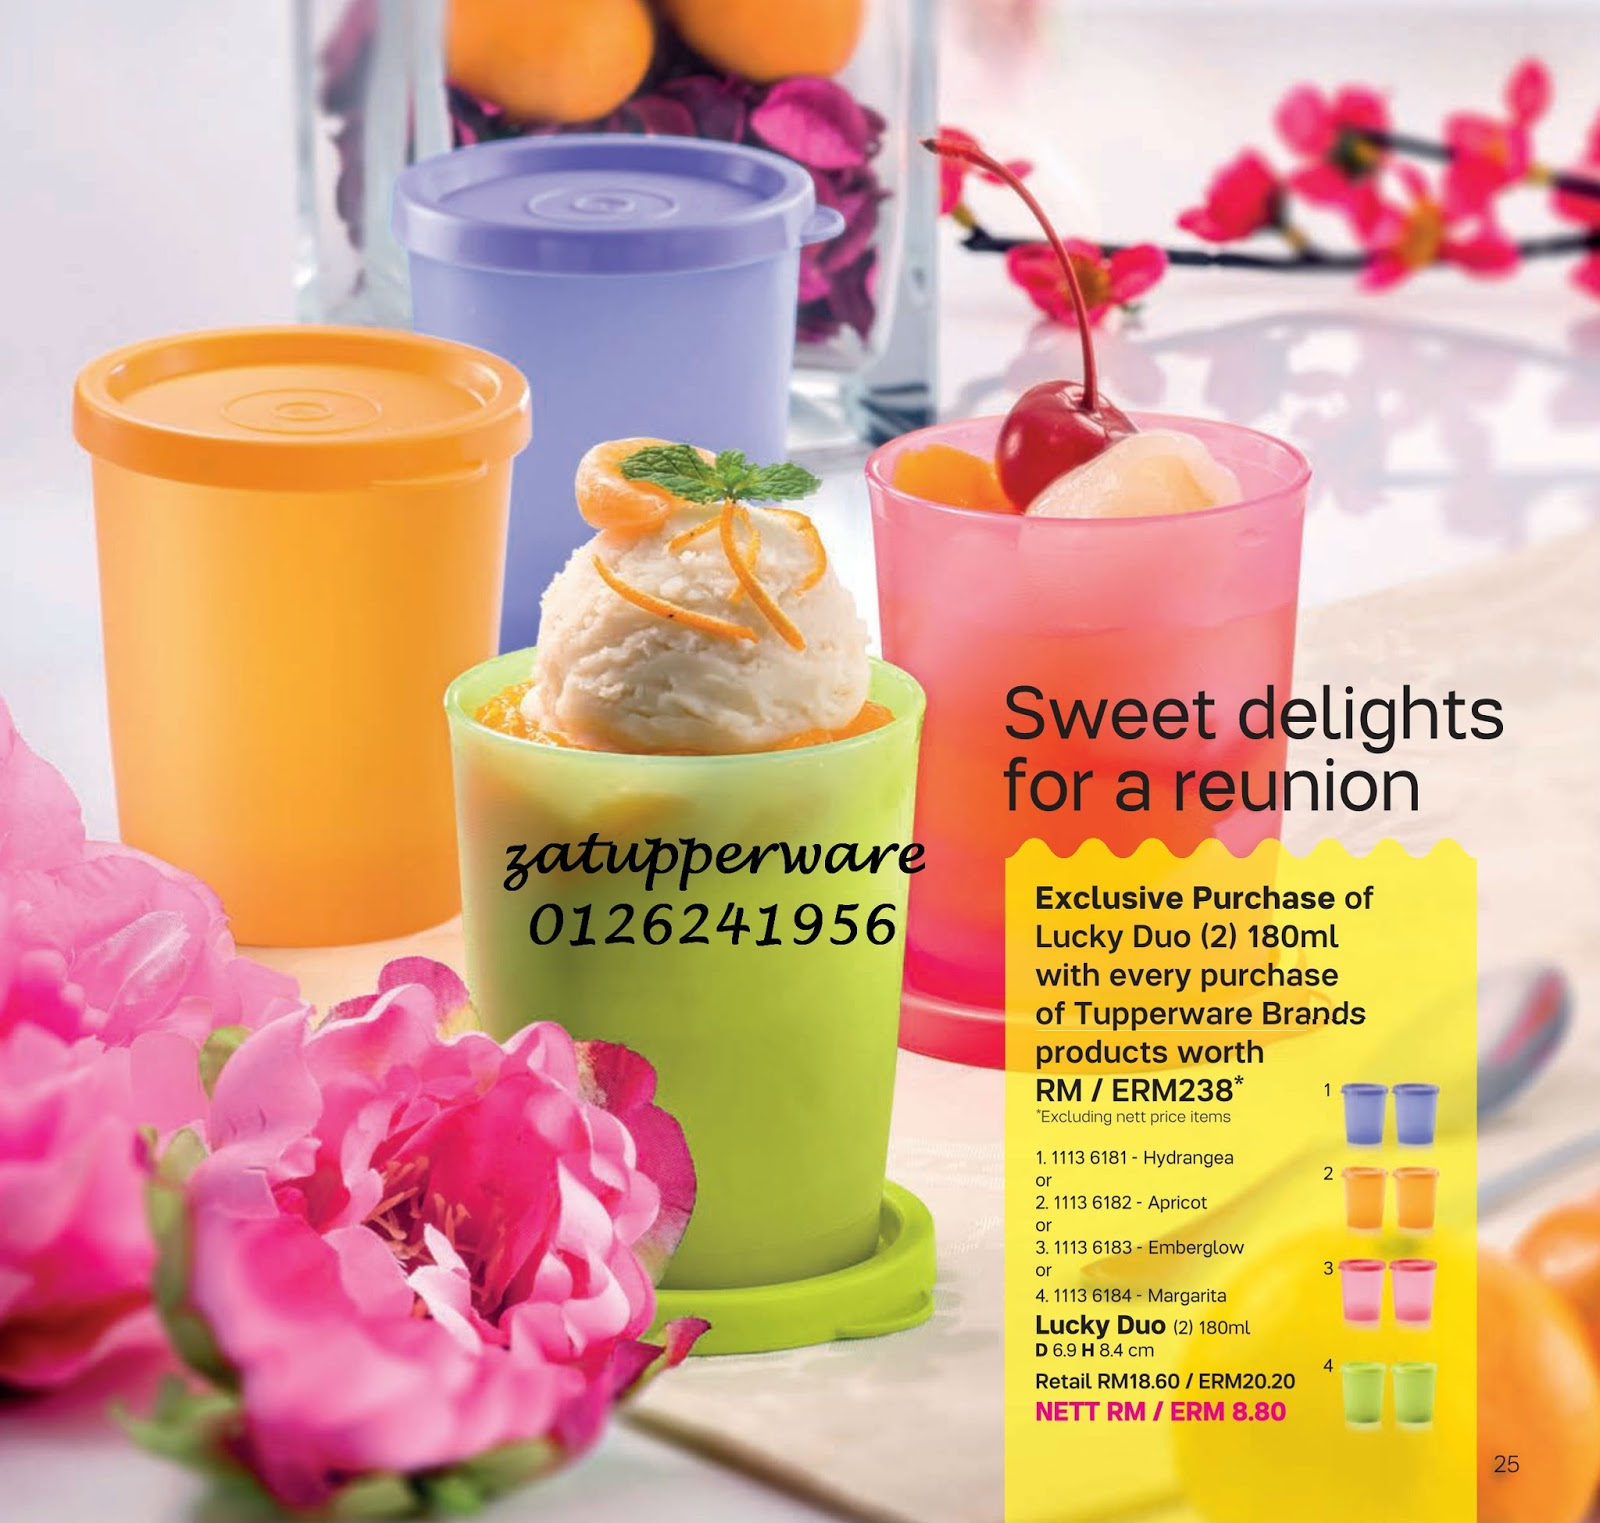 Za Tupperware Brands Malaysia : Latest Catalogue 2018